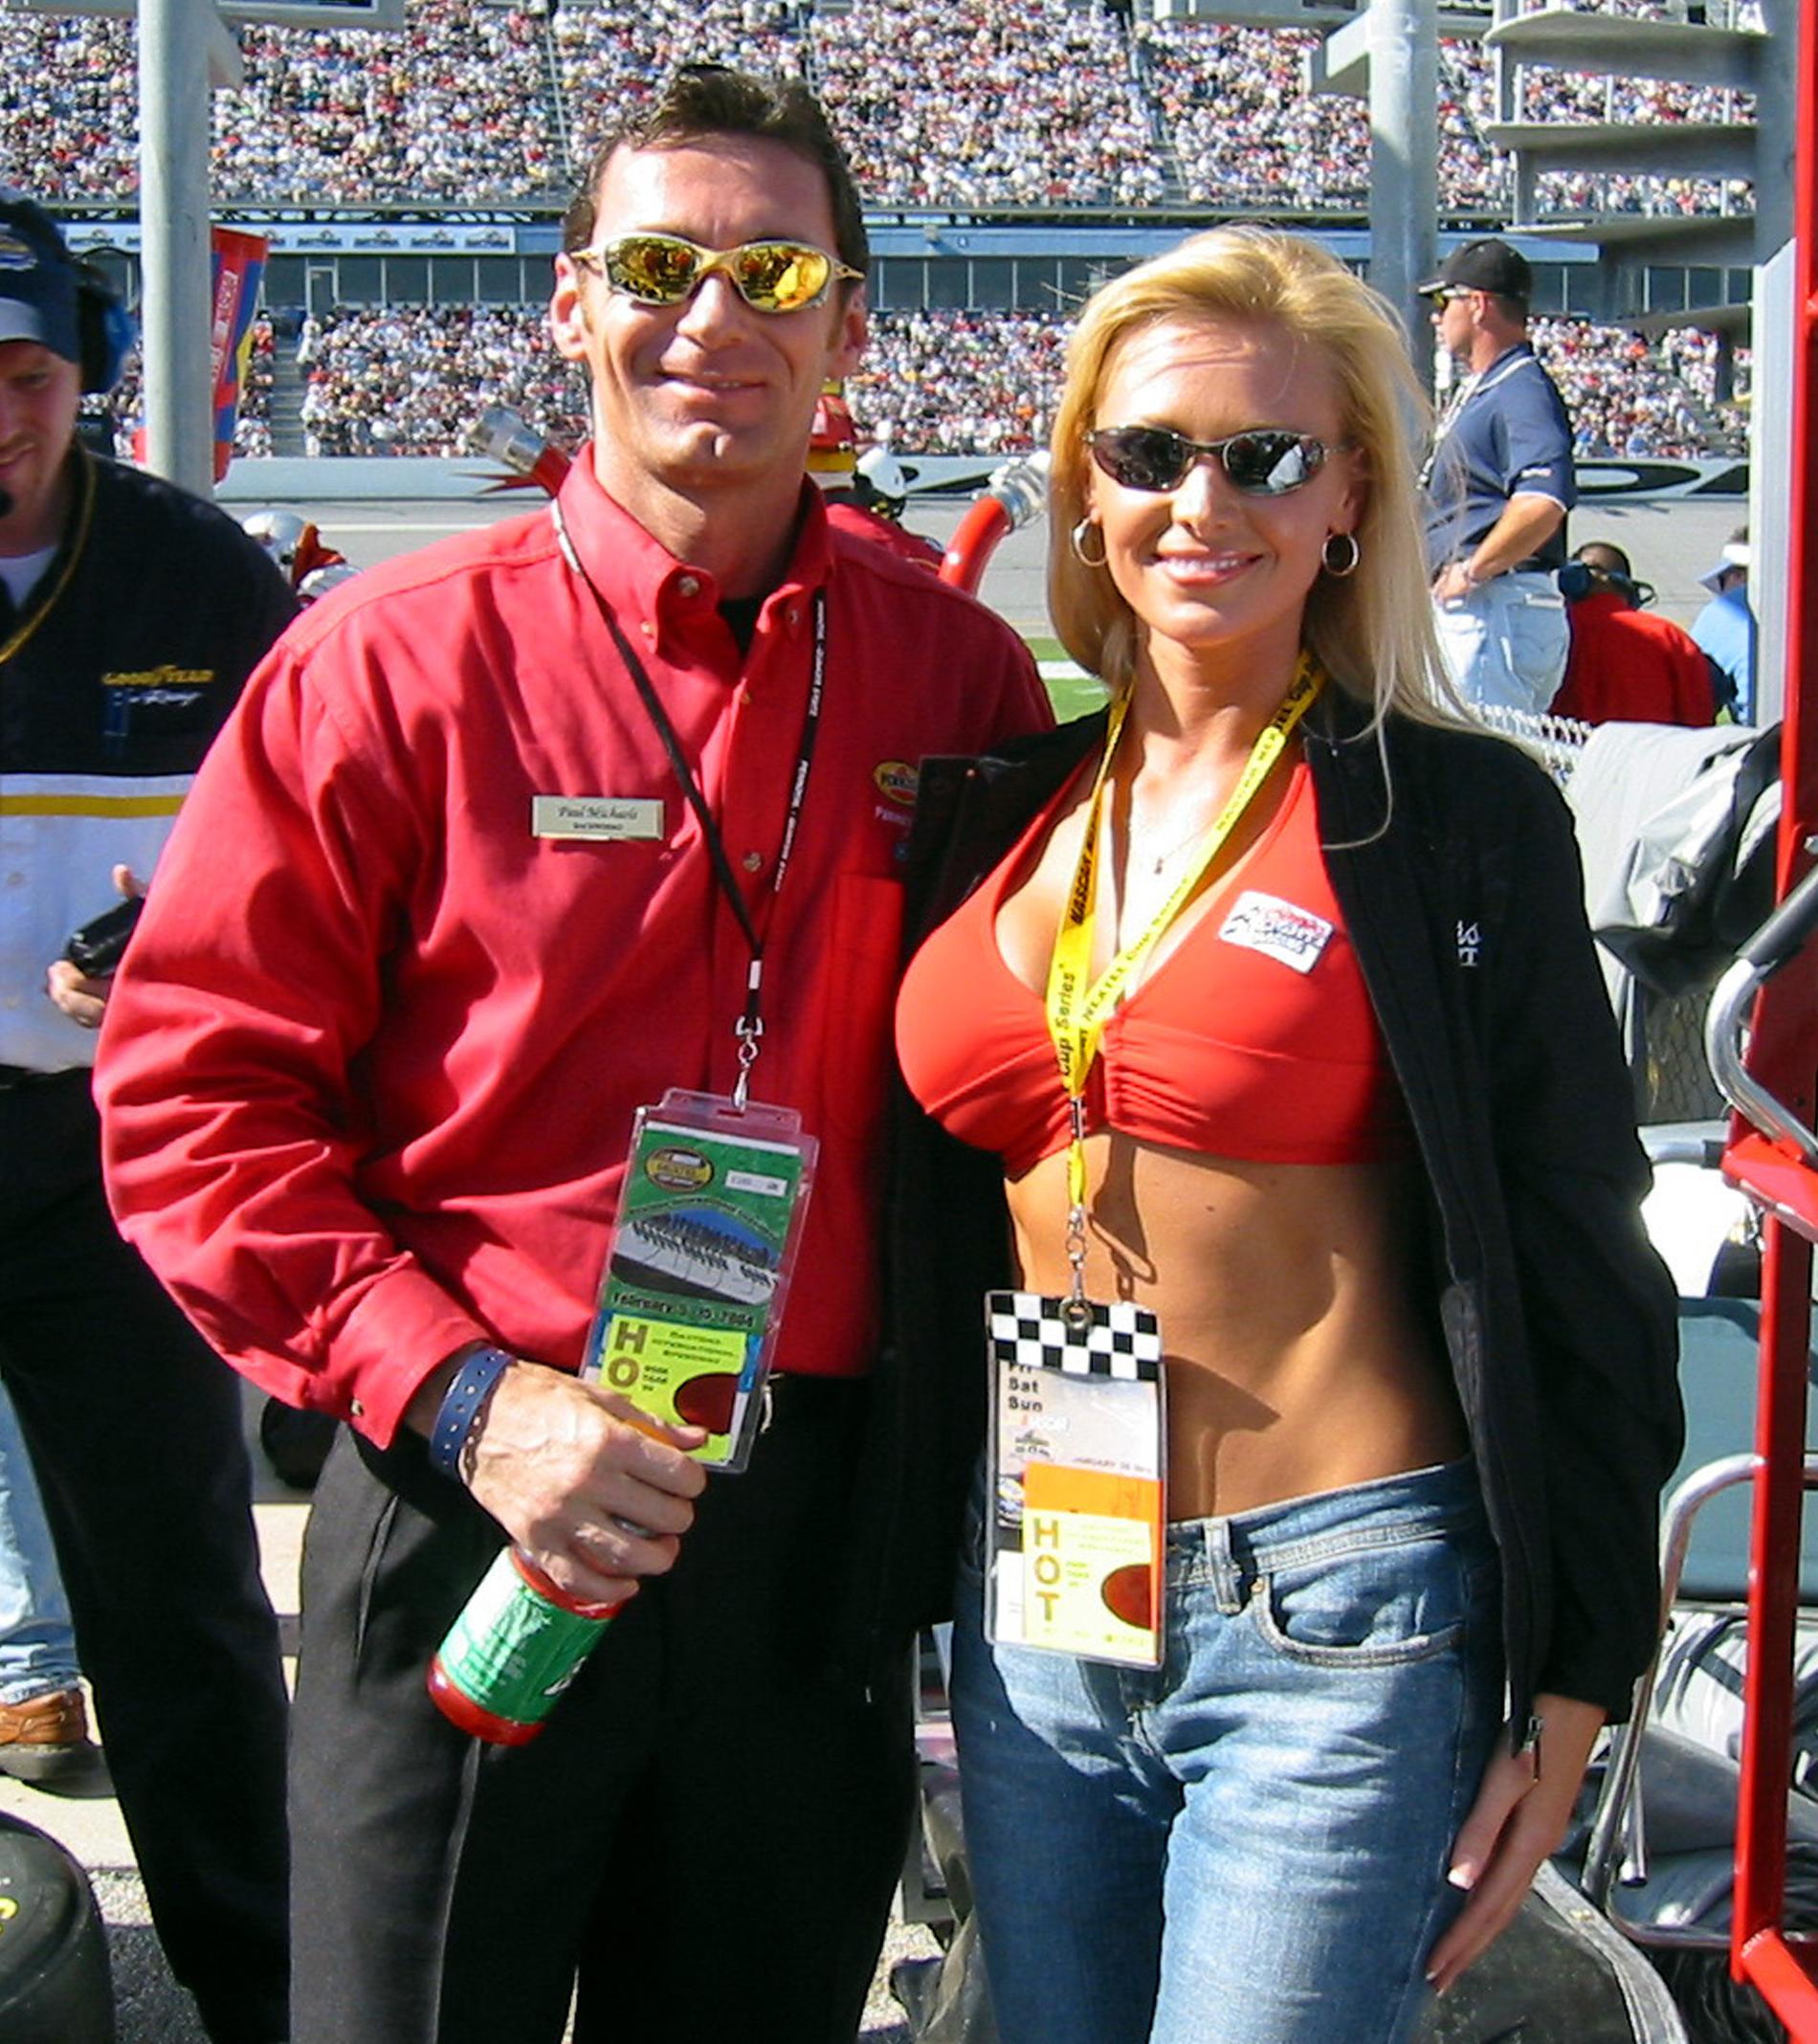 Jennifer @ Daytona 500 8x10